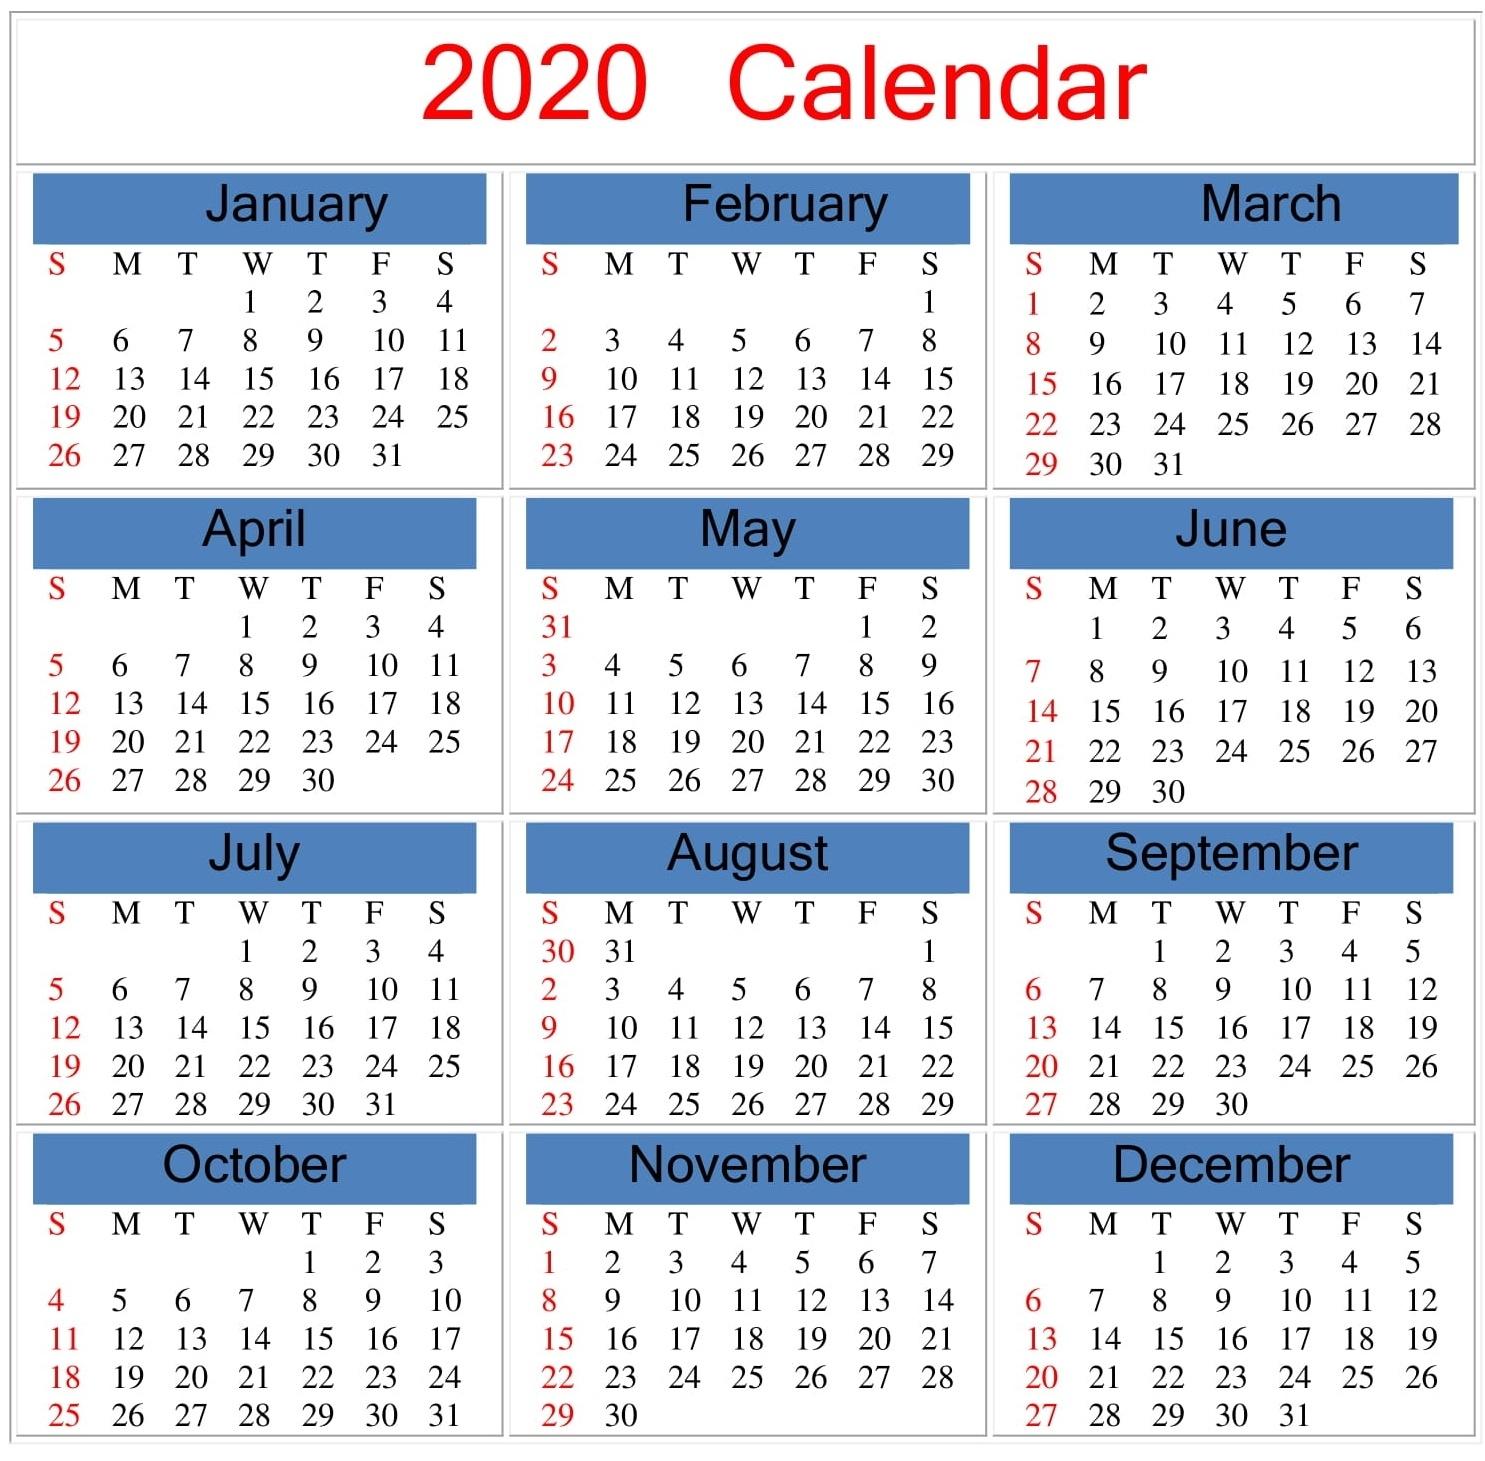 Free Printable 2020 Calendar Word Document - Latest